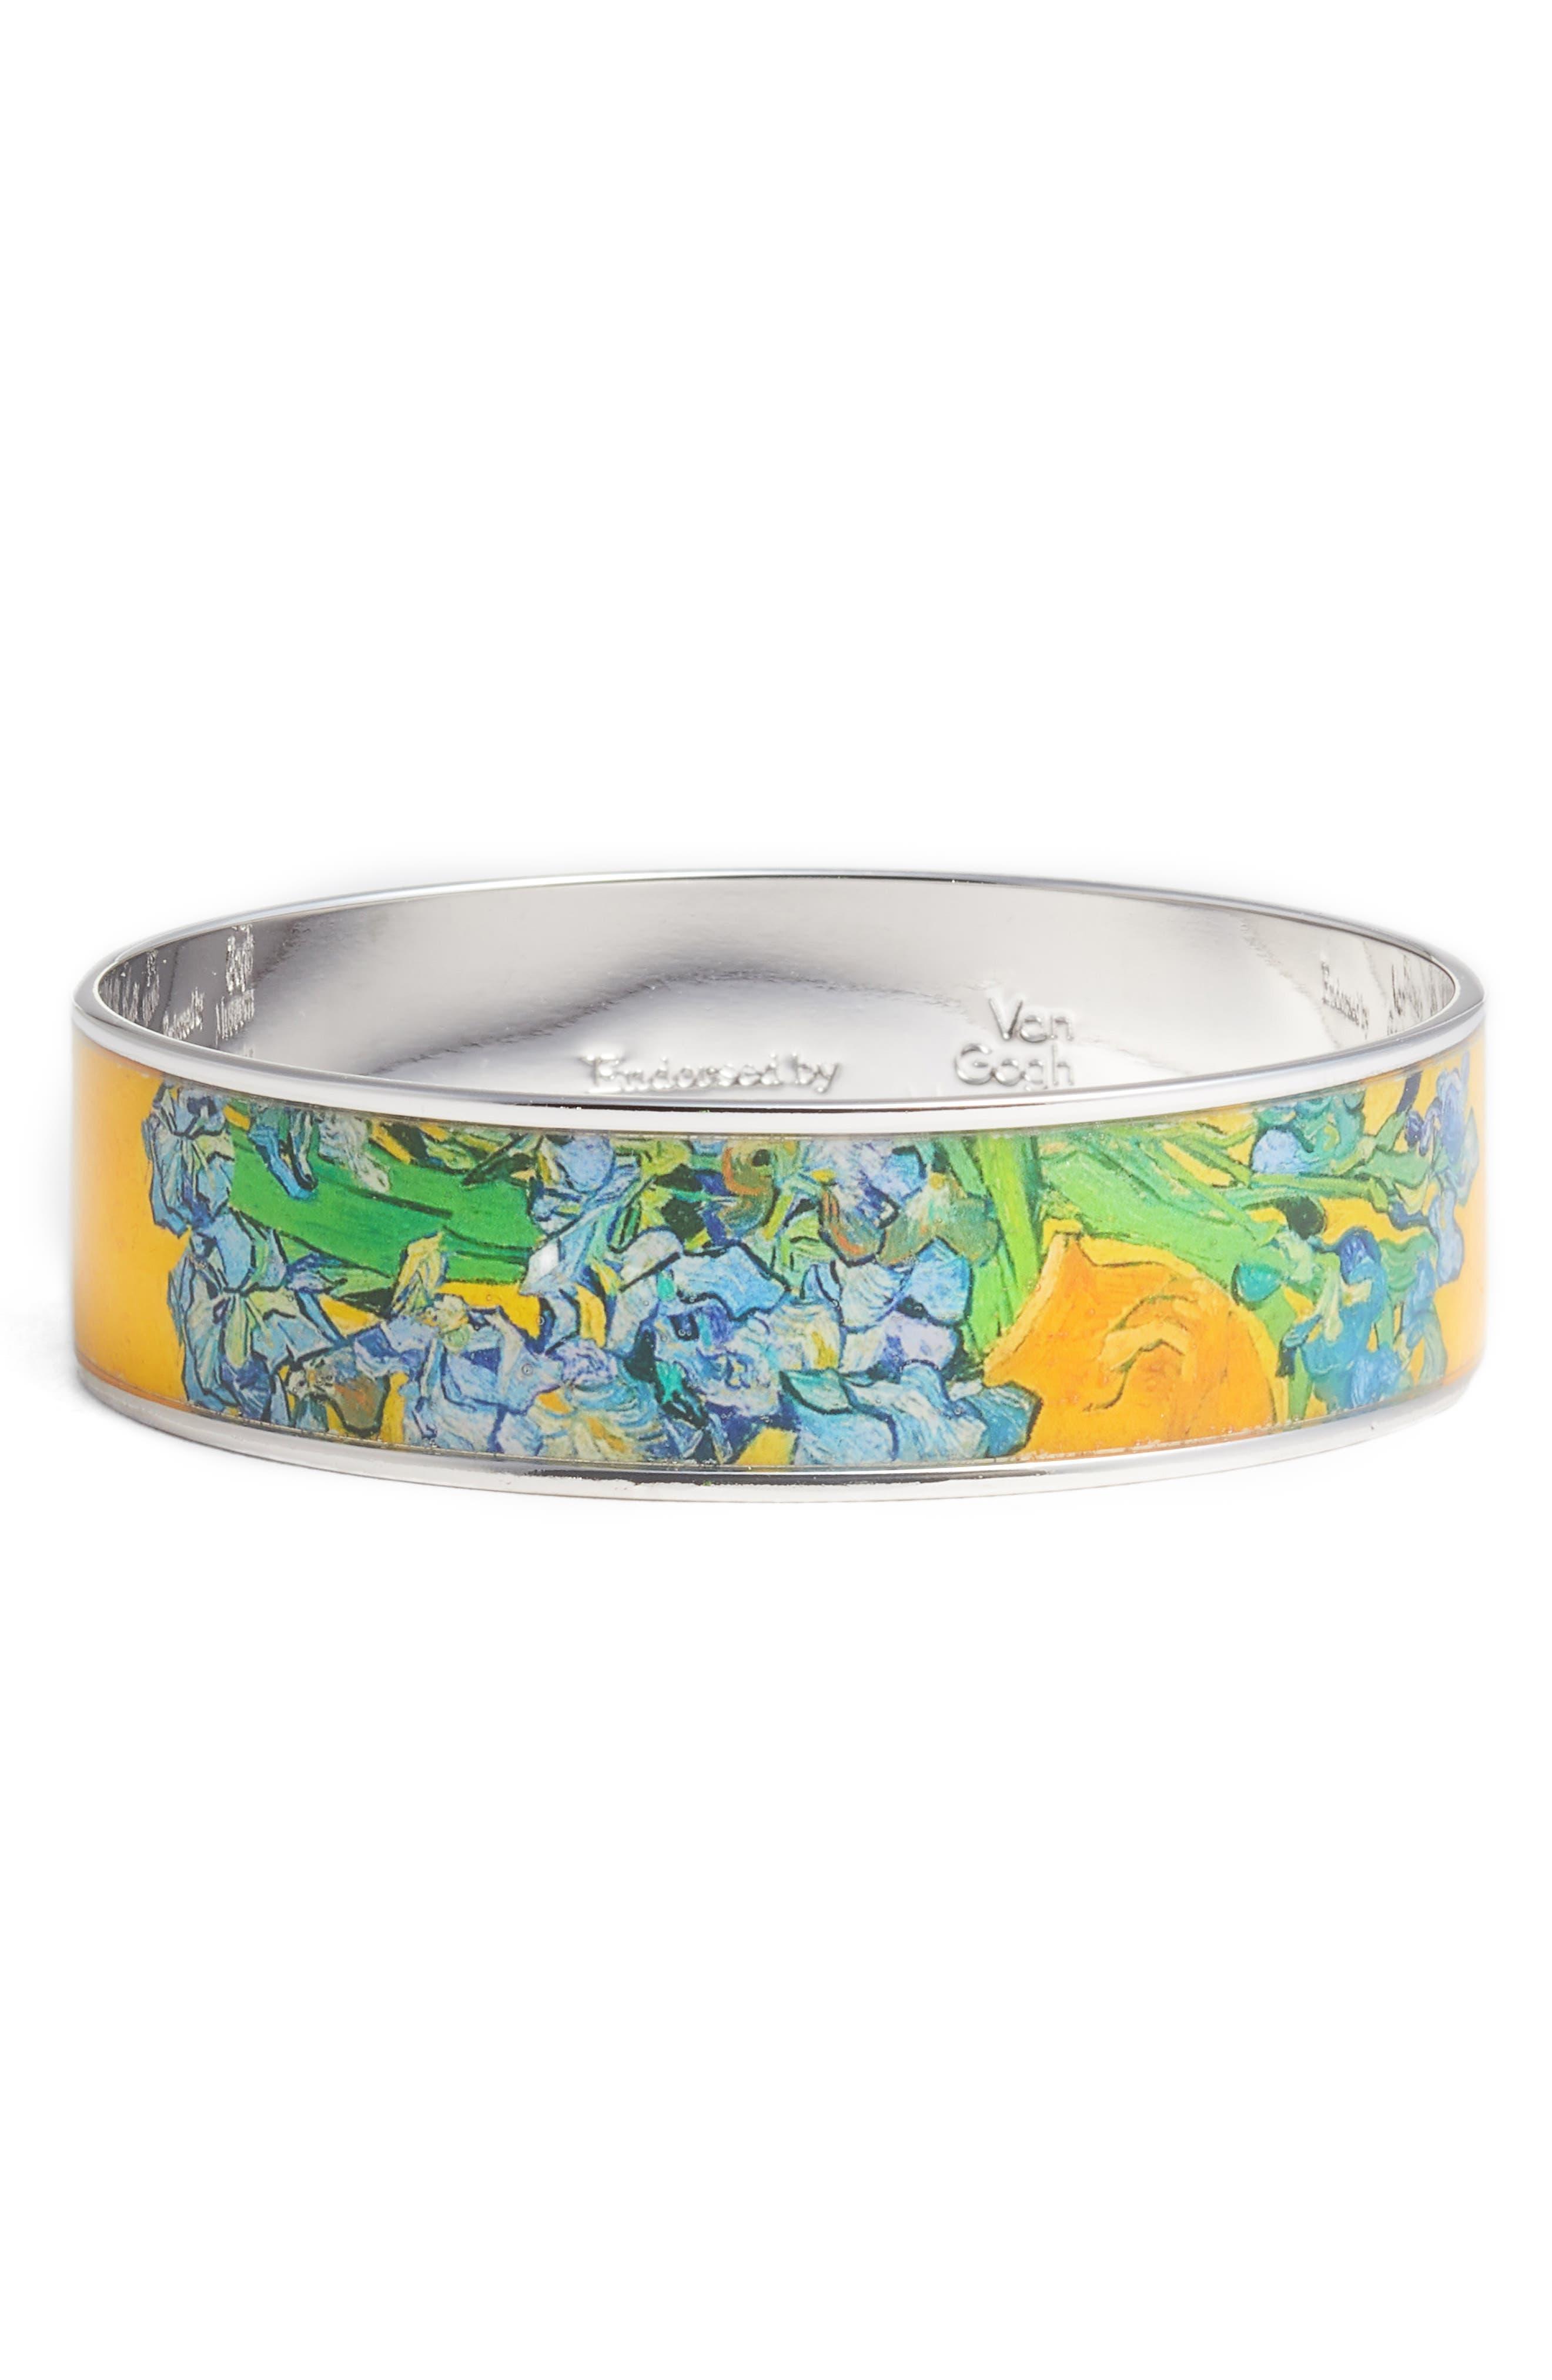 Irises Medium Bangle Bracelet,                             Main thumbnail 1, color,                             YELLOW/ SILVER